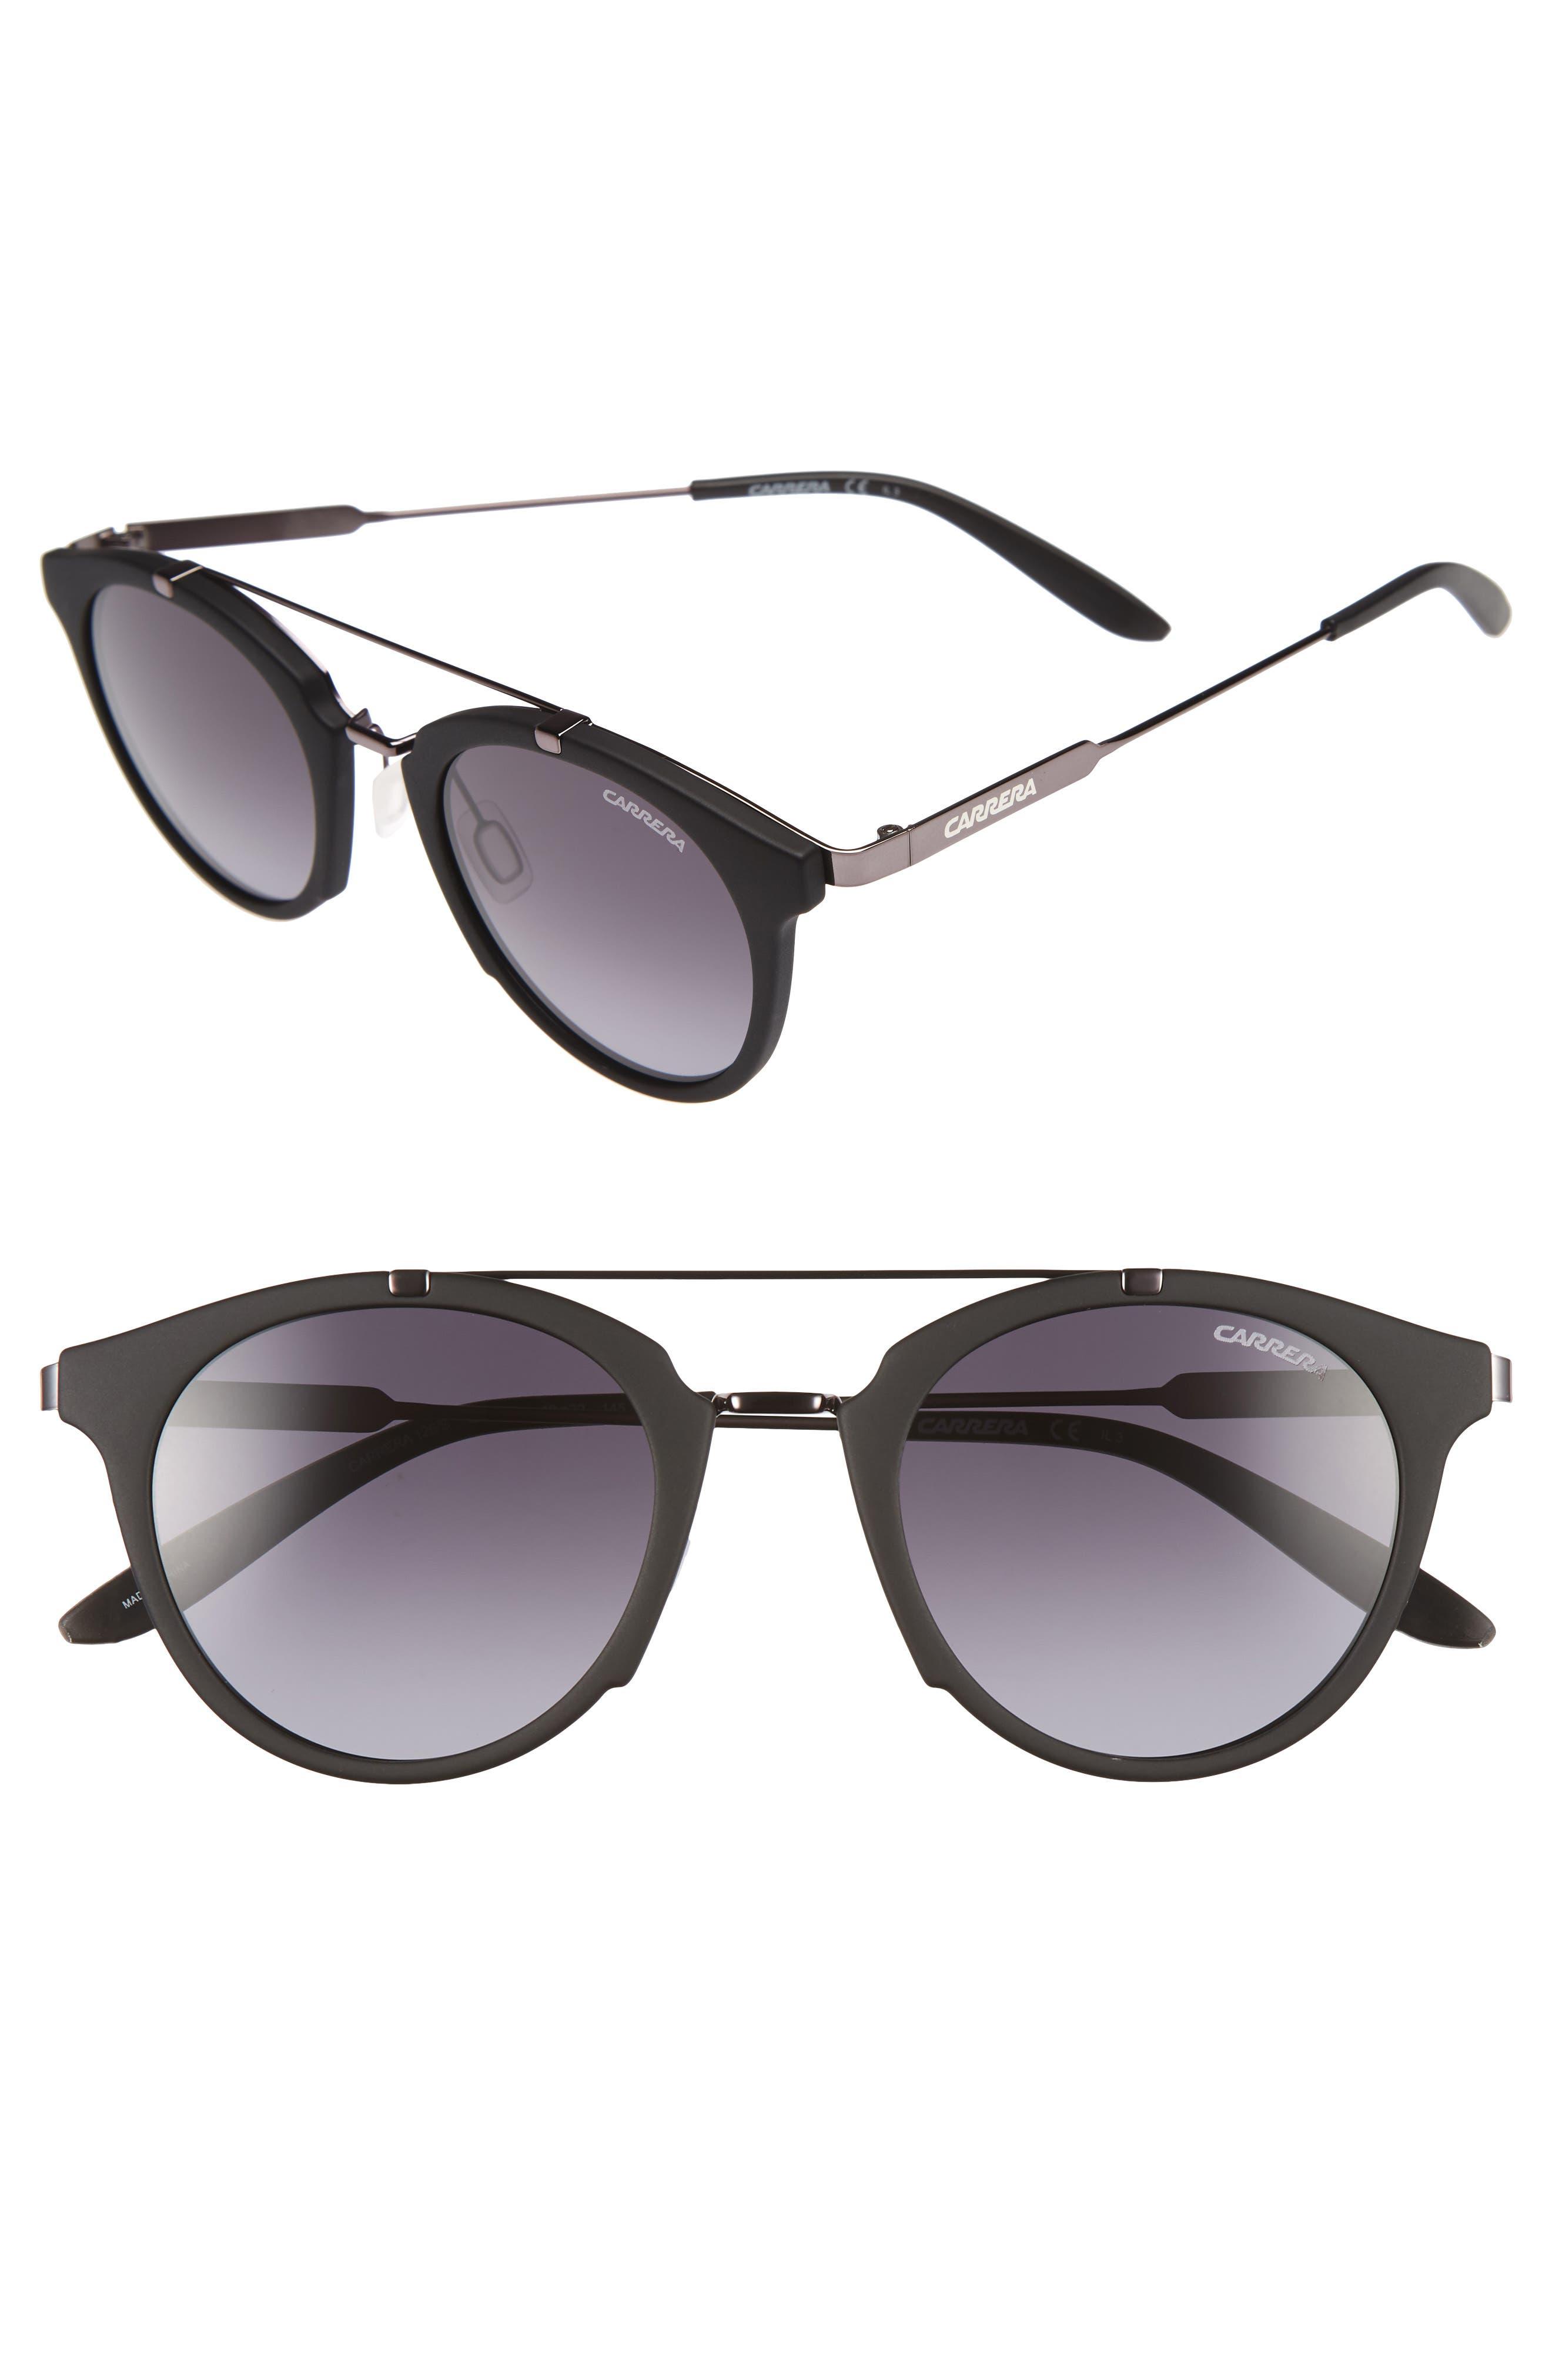 Main Image - Carrera Eyewear Retro 49mm Sunglasses